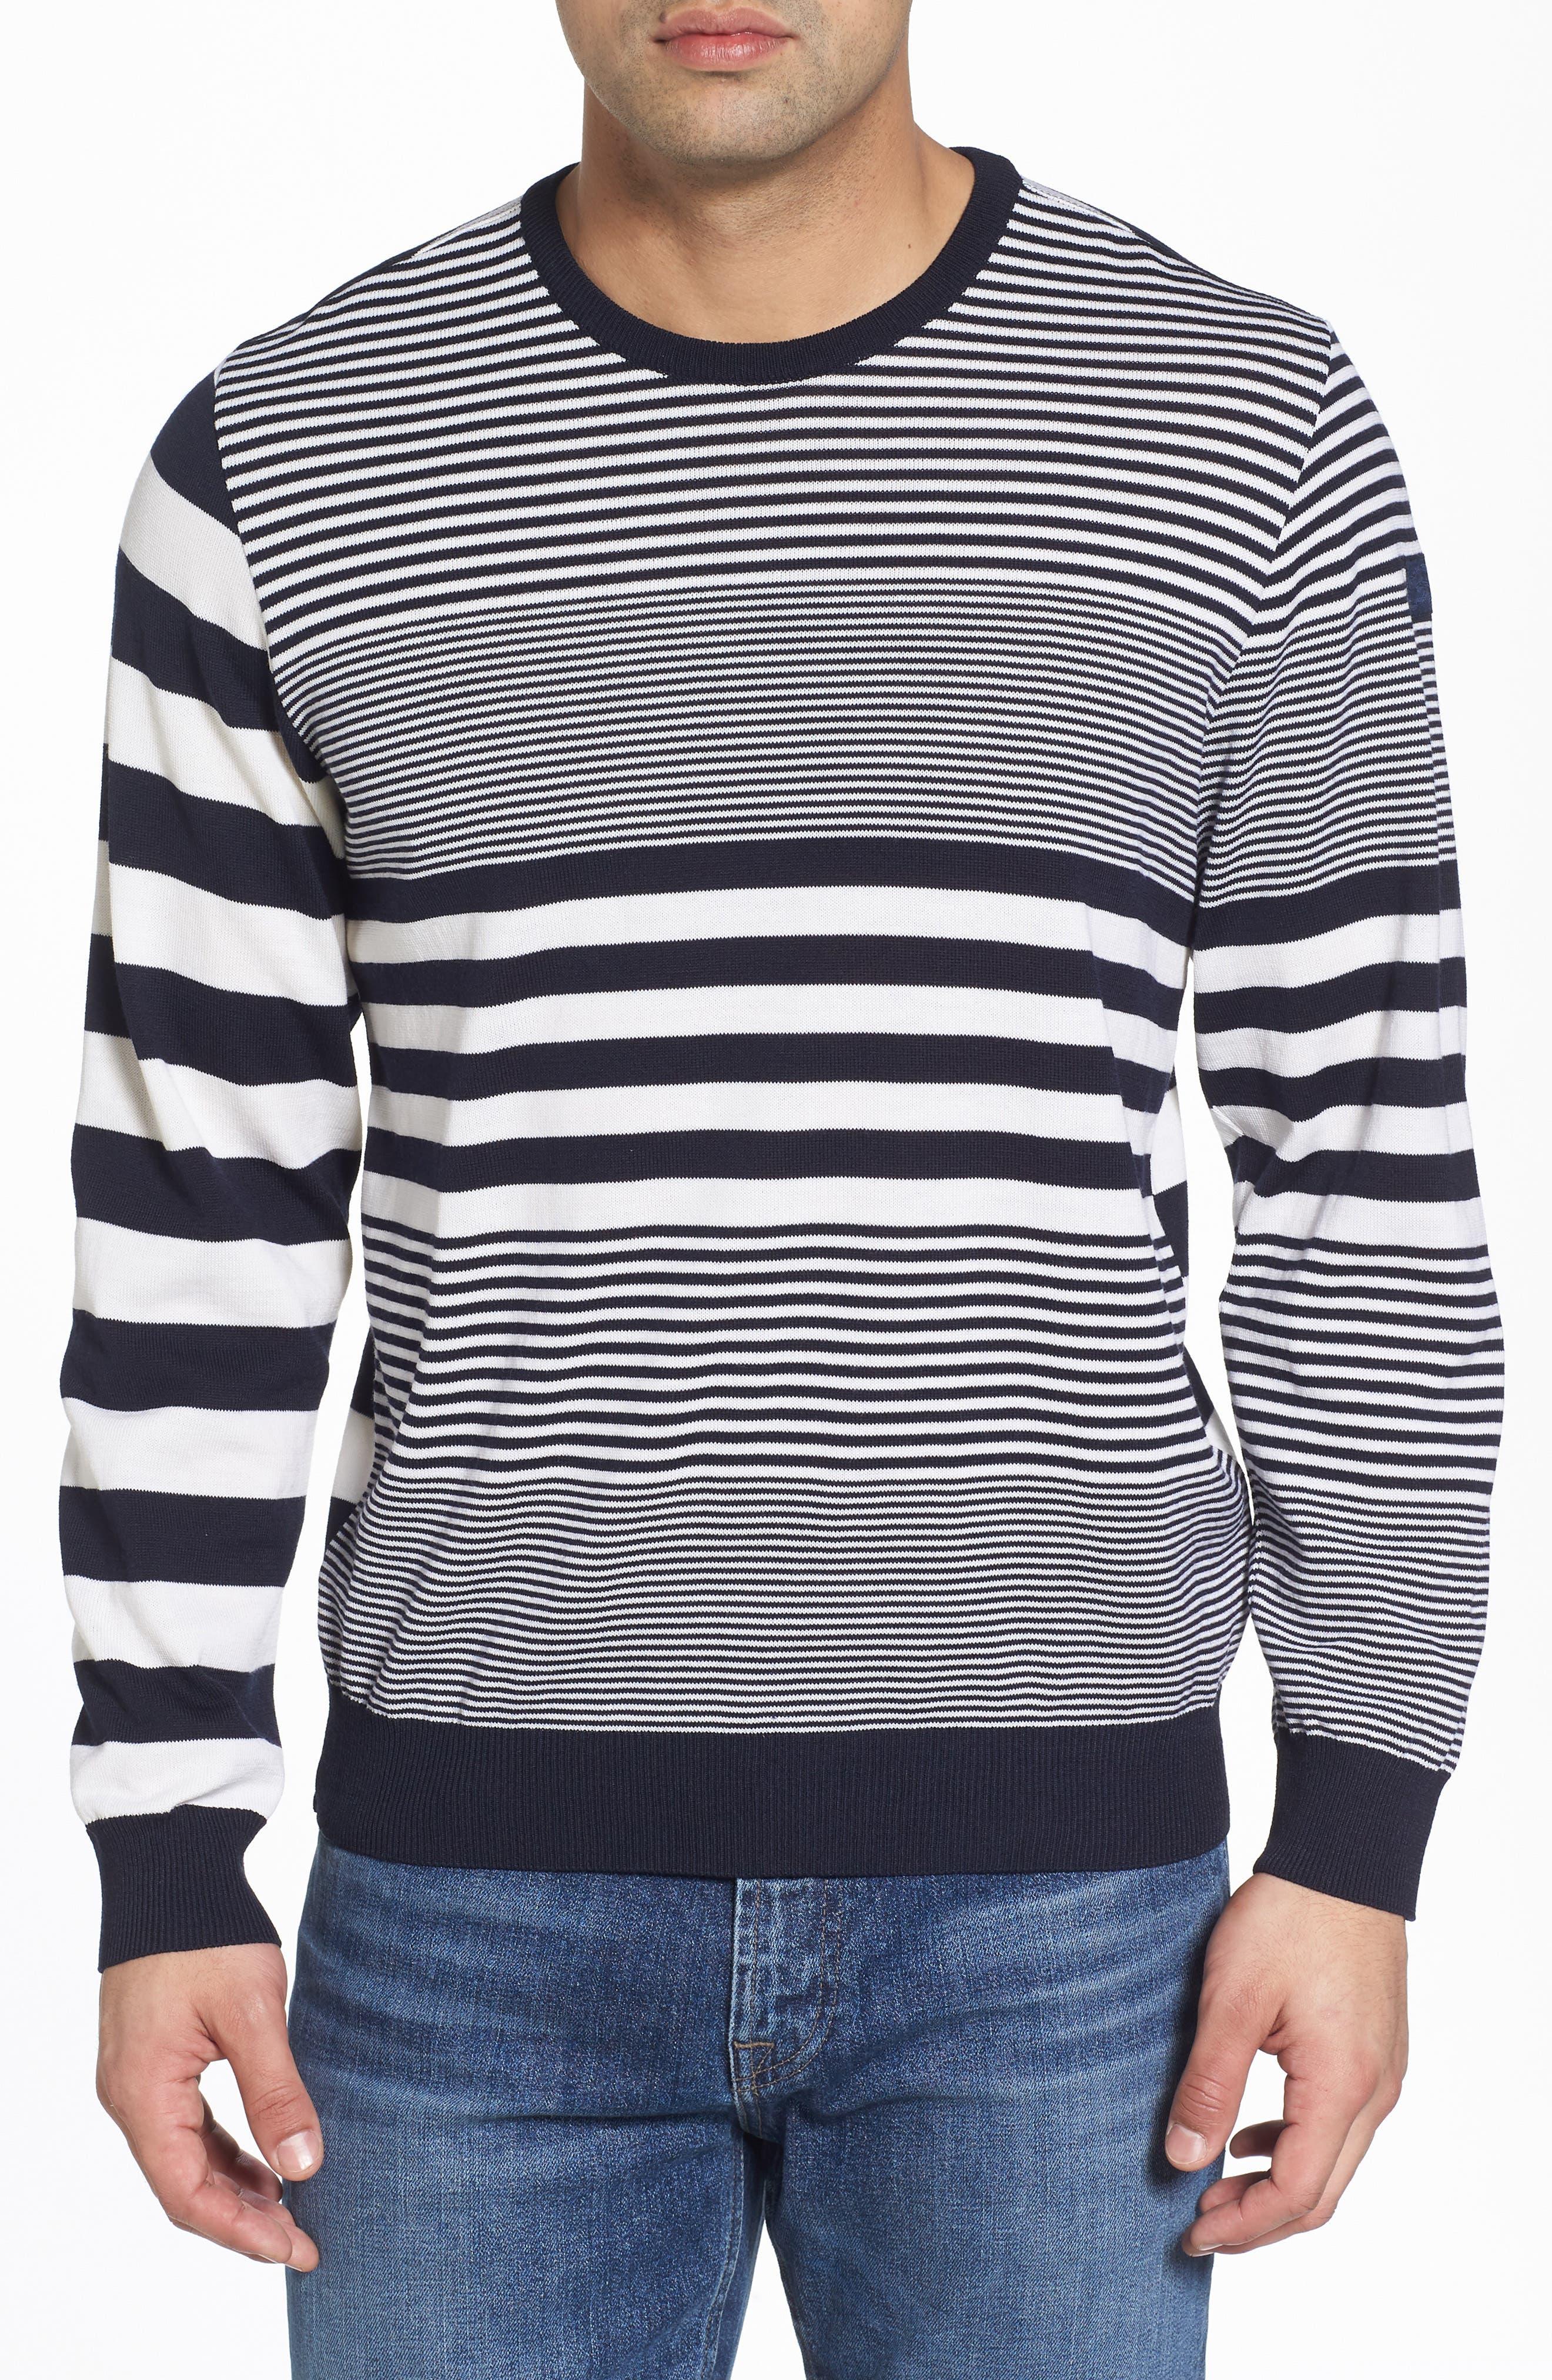 Paul&Shark Stripe Wool Sweater,                             Main thumbnail 1, color,                             Navy/ White